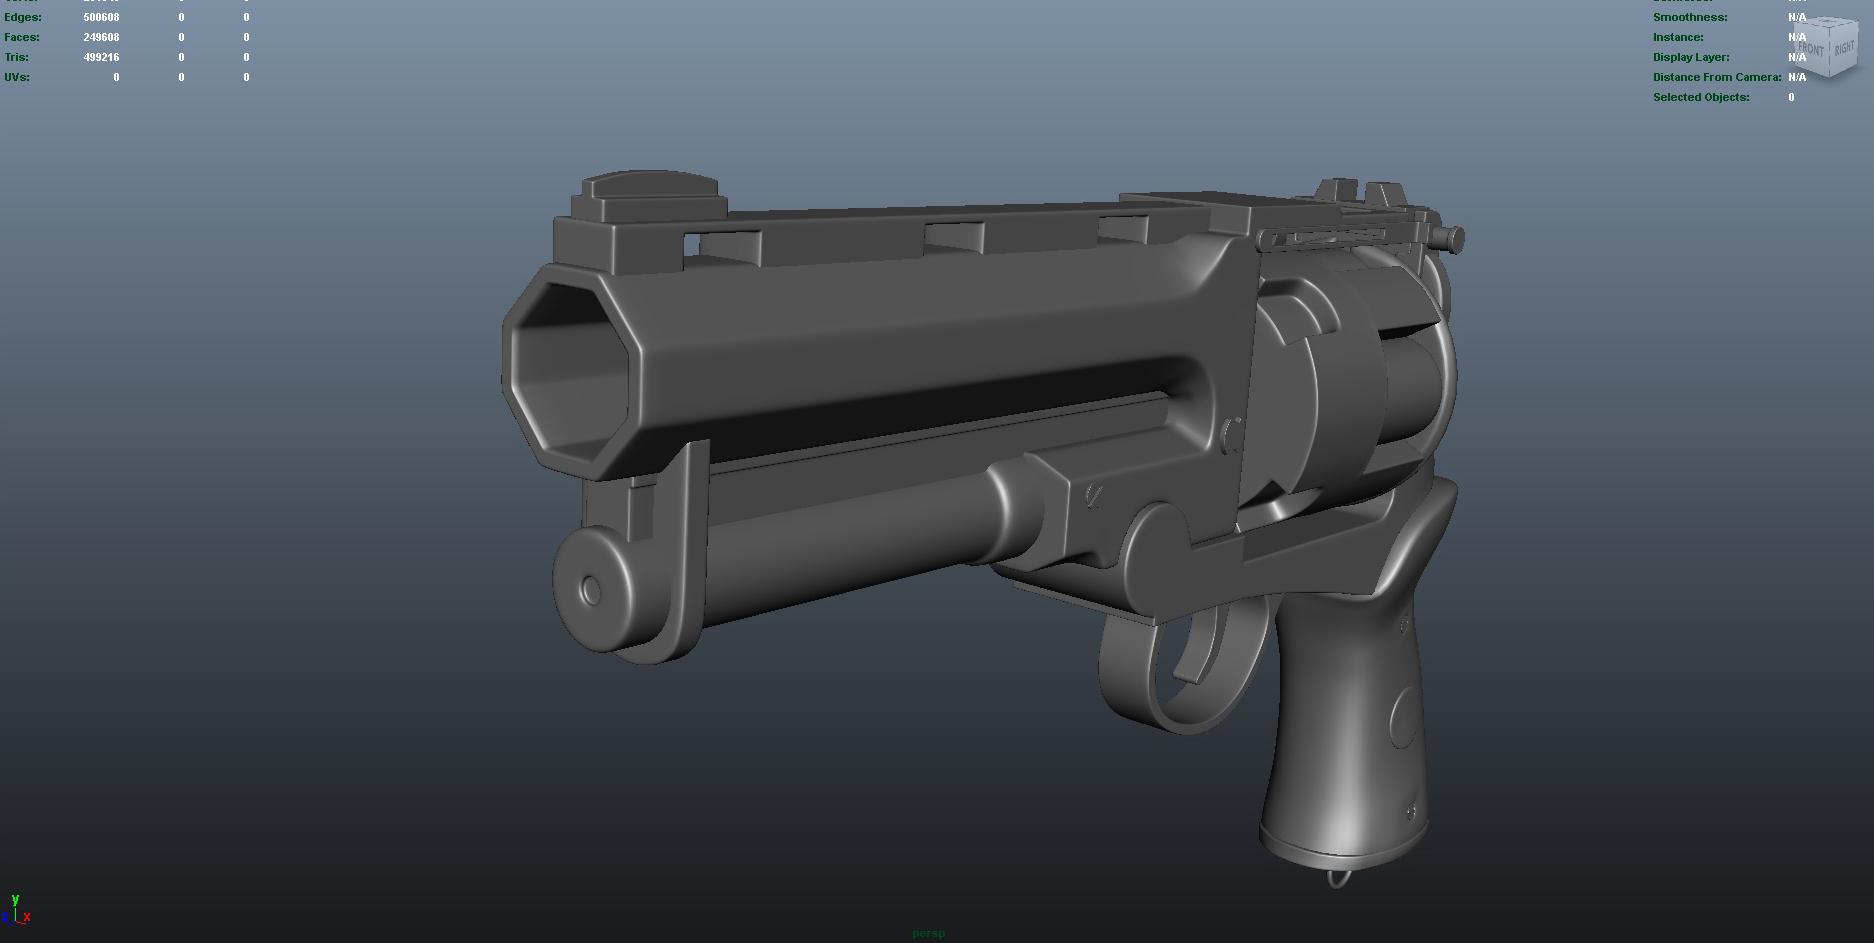 gun 3d model fbx dae ma mb obj 153251